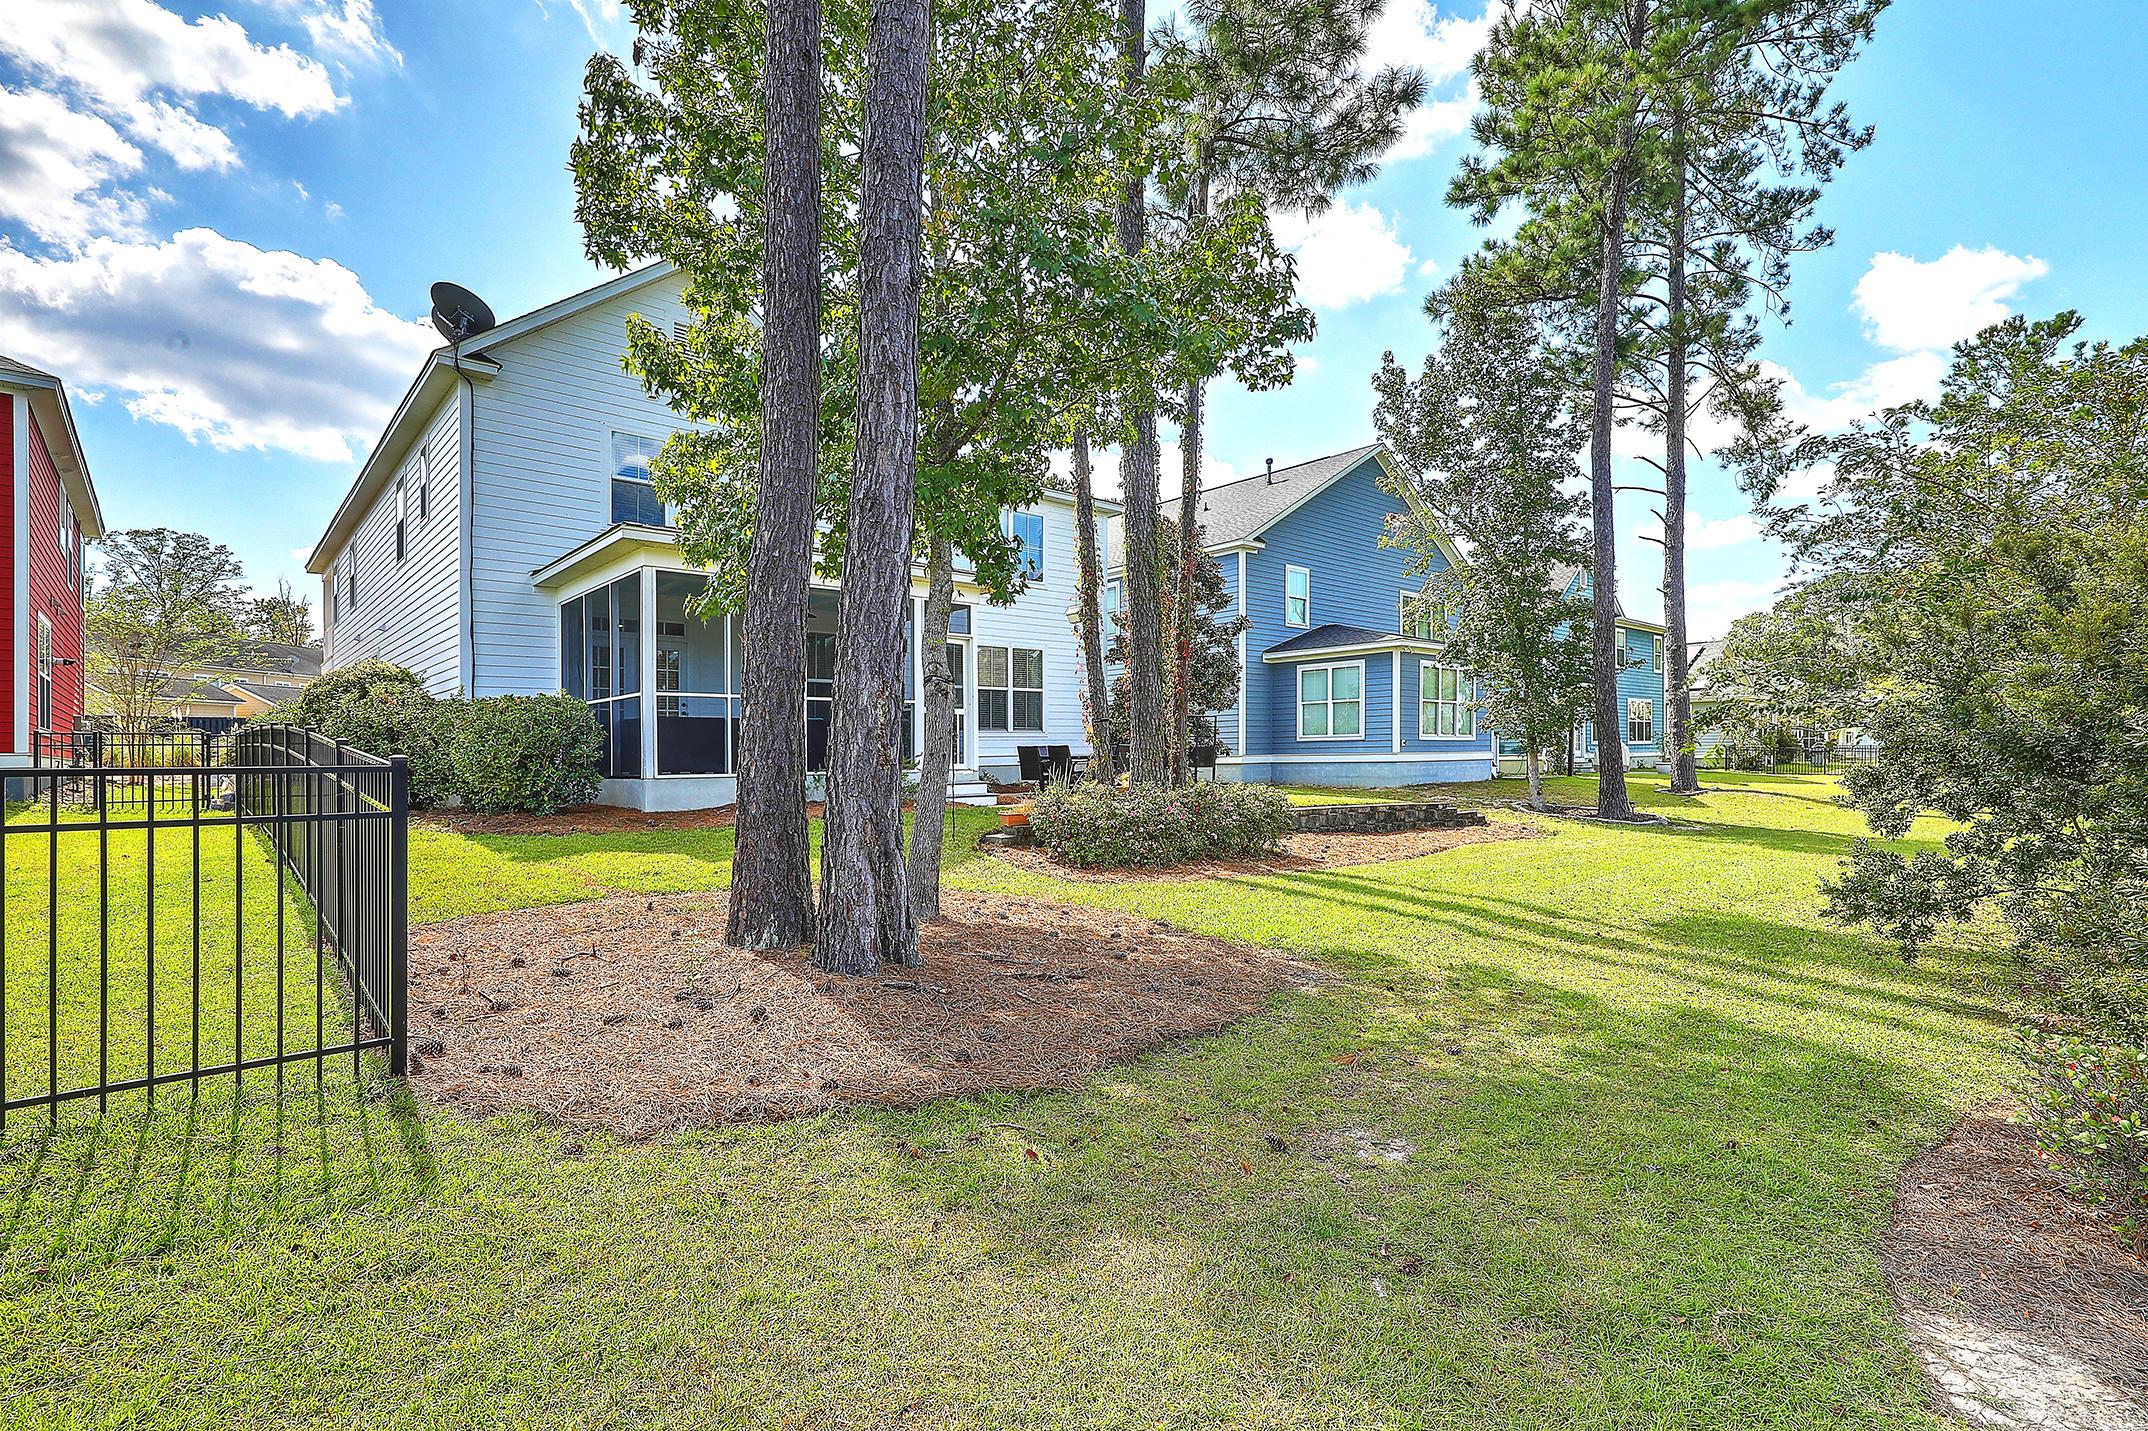 Branch Creek Homes For Sale - 304 Pond Hill, Summerville, SC - 2